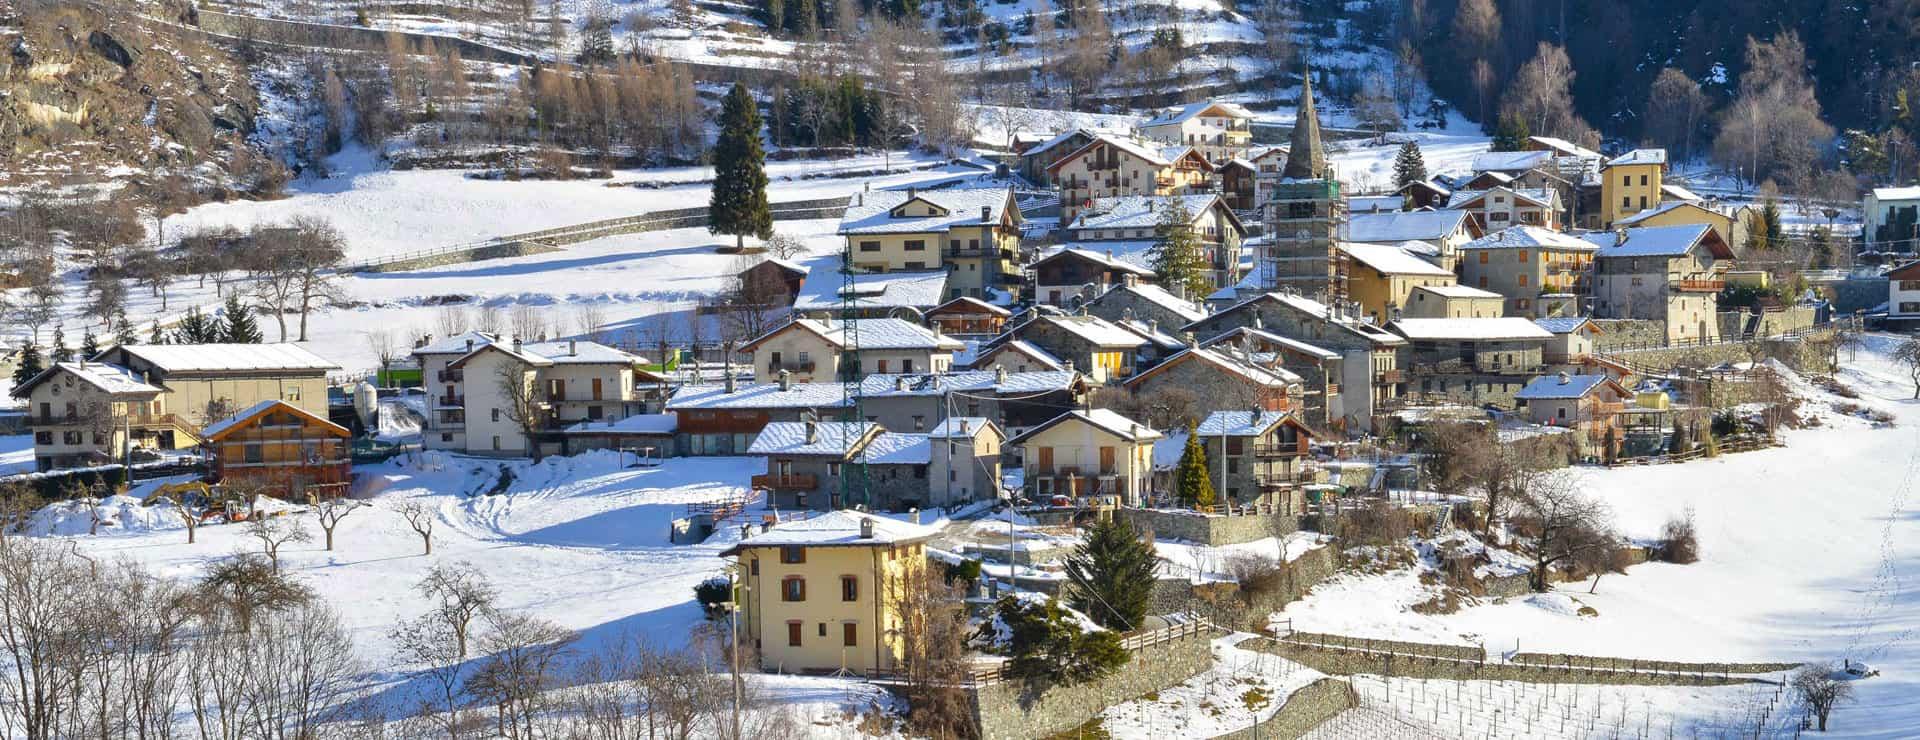 Antey-Saint-André-neve-inverno